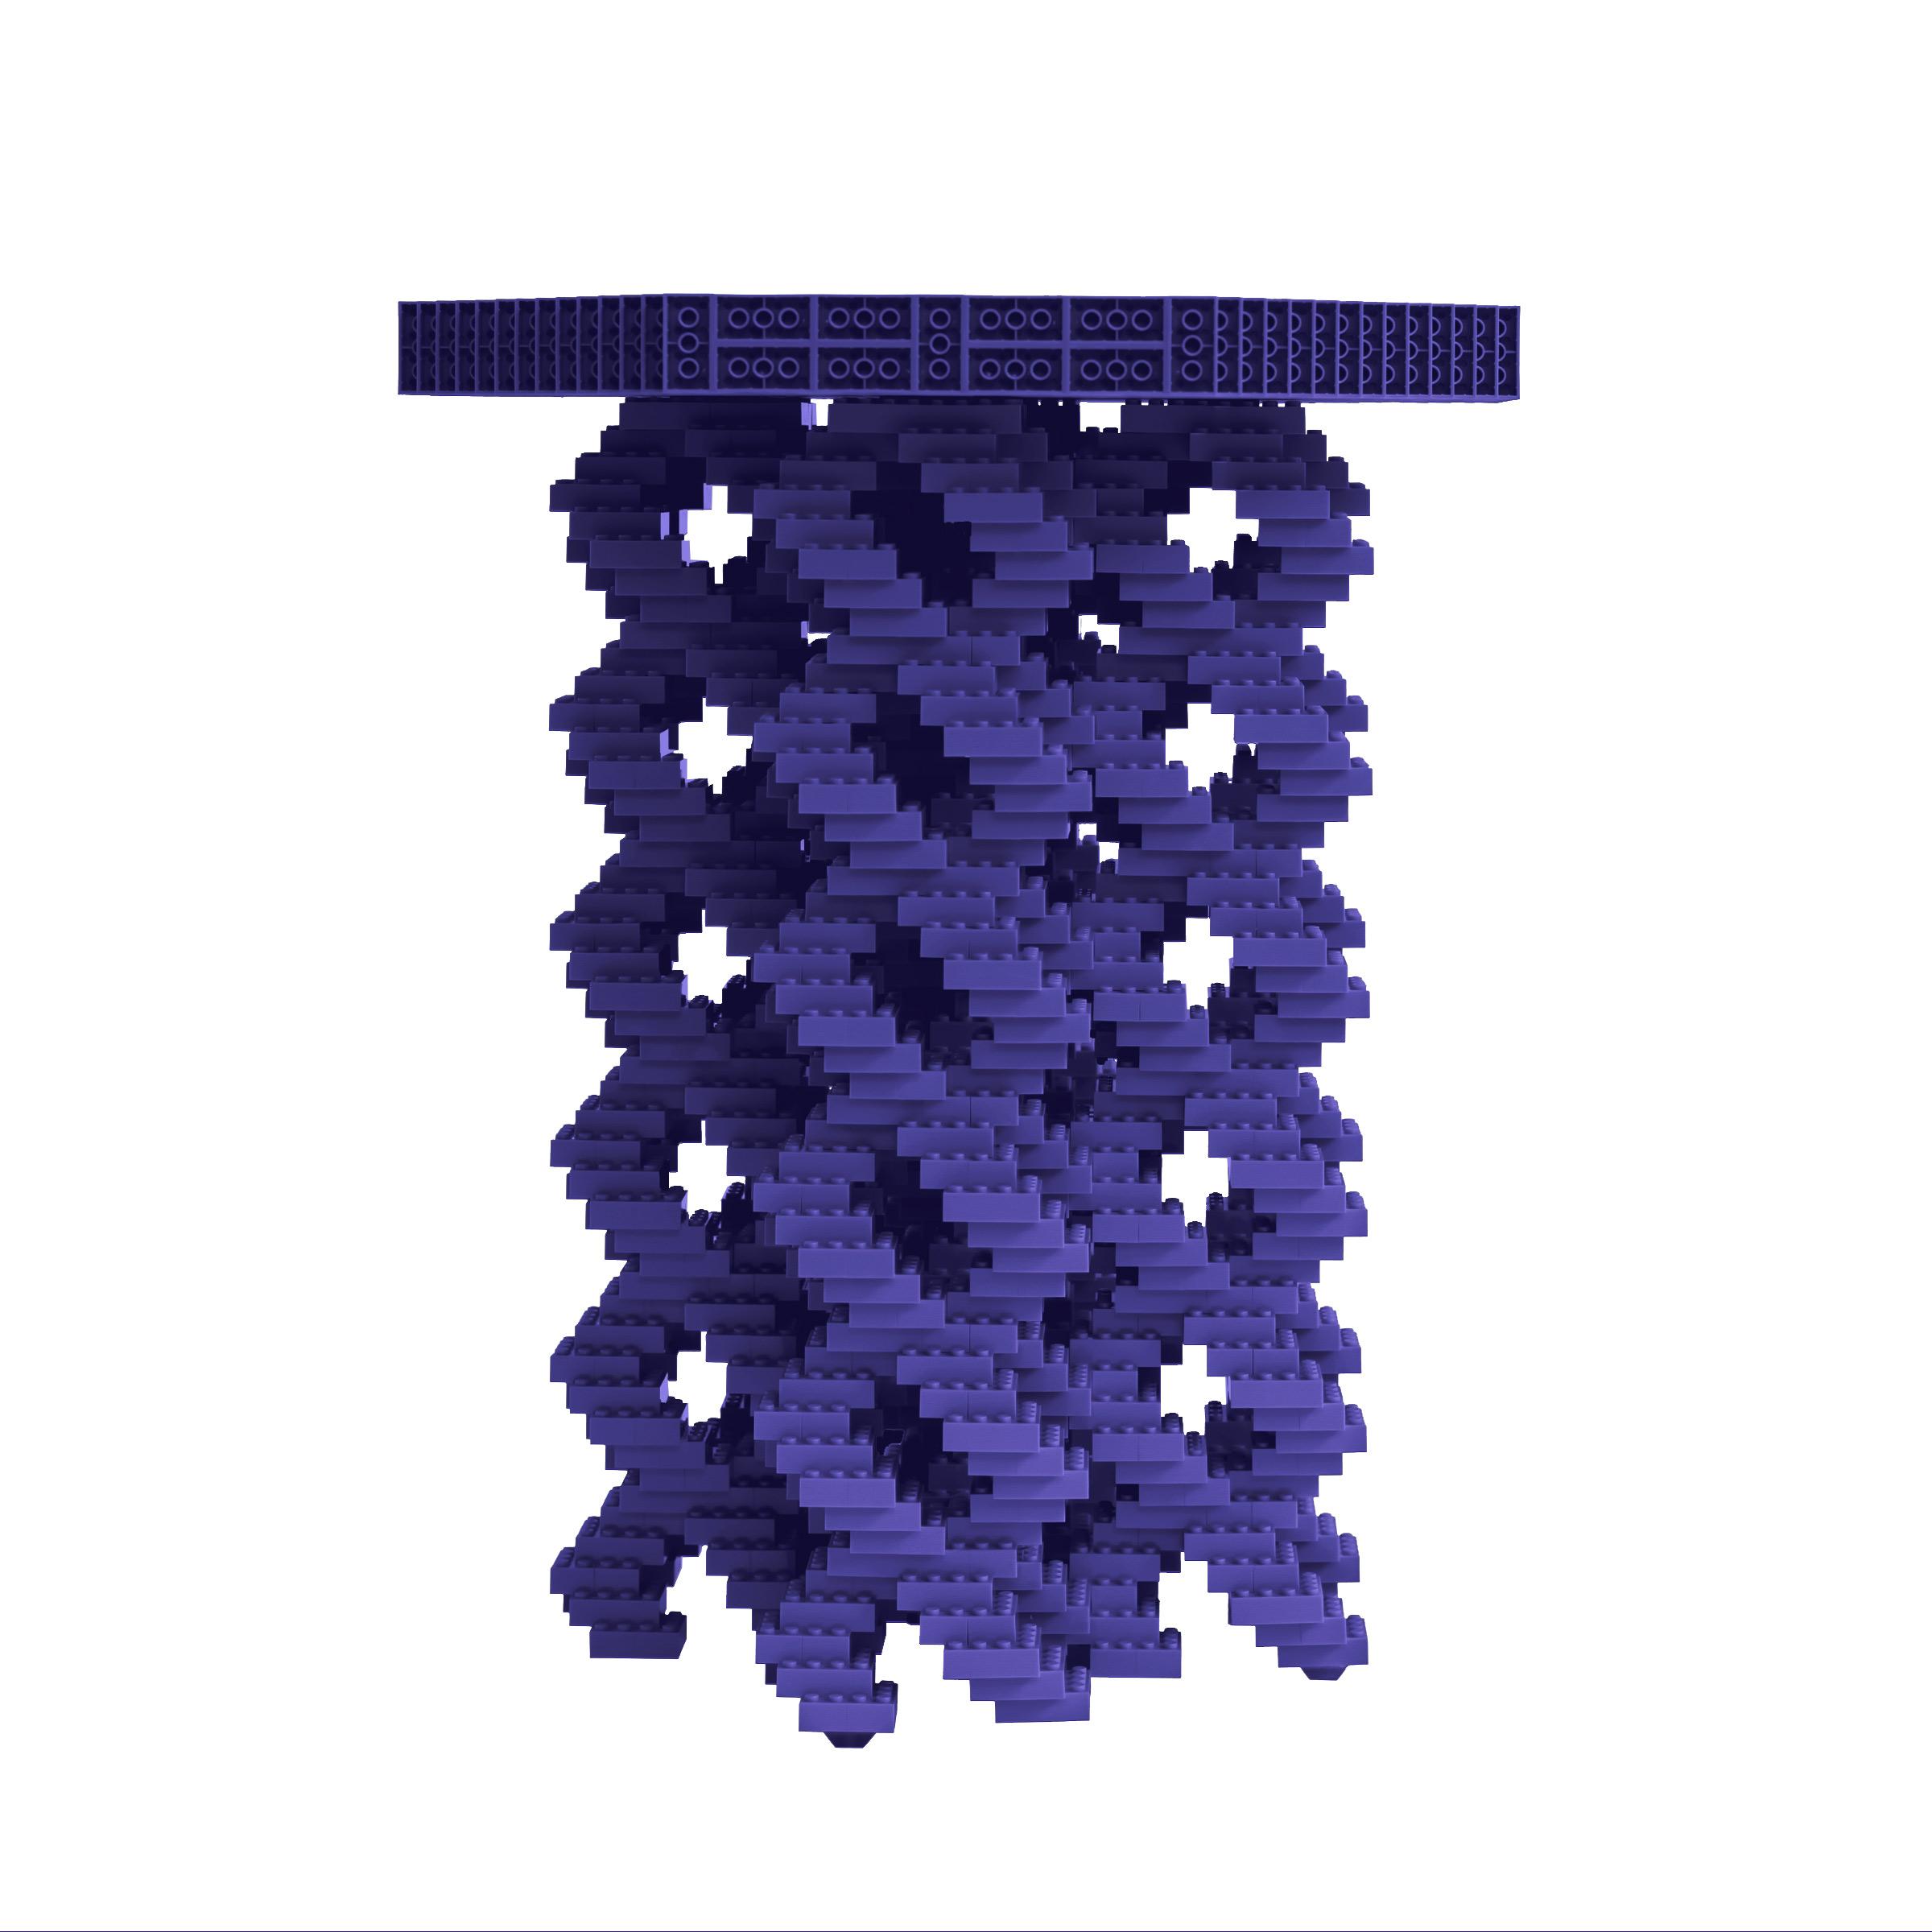 helixtable-grape.jpg